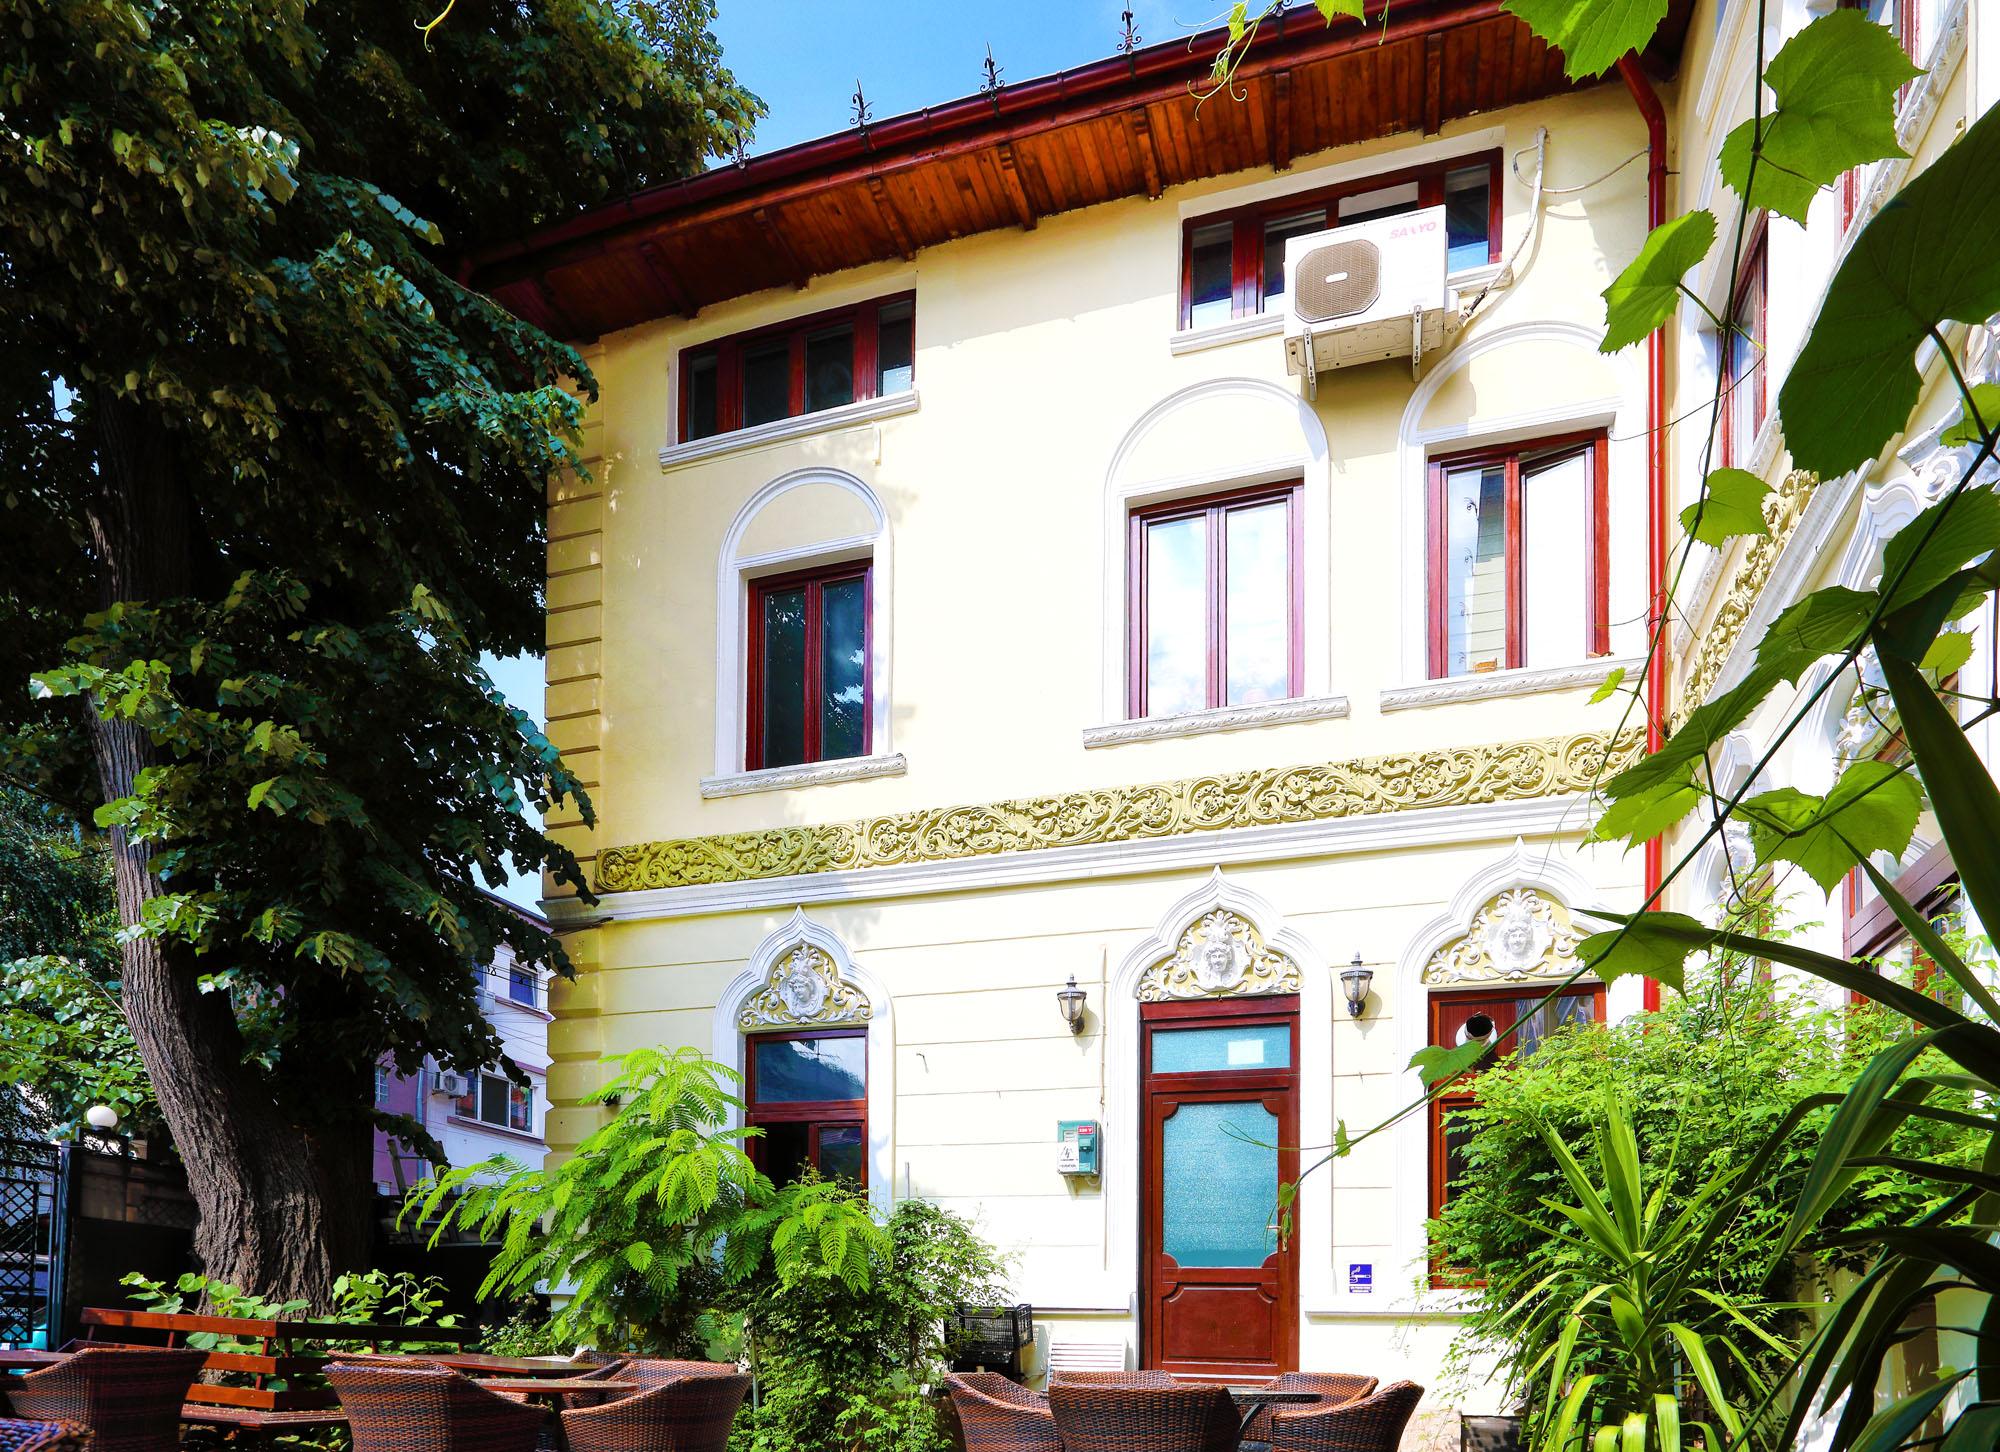 https://ahe-ro.s3.amazonaws.com/2851/casa_cu_ferestre_venetiene_6_.jpg